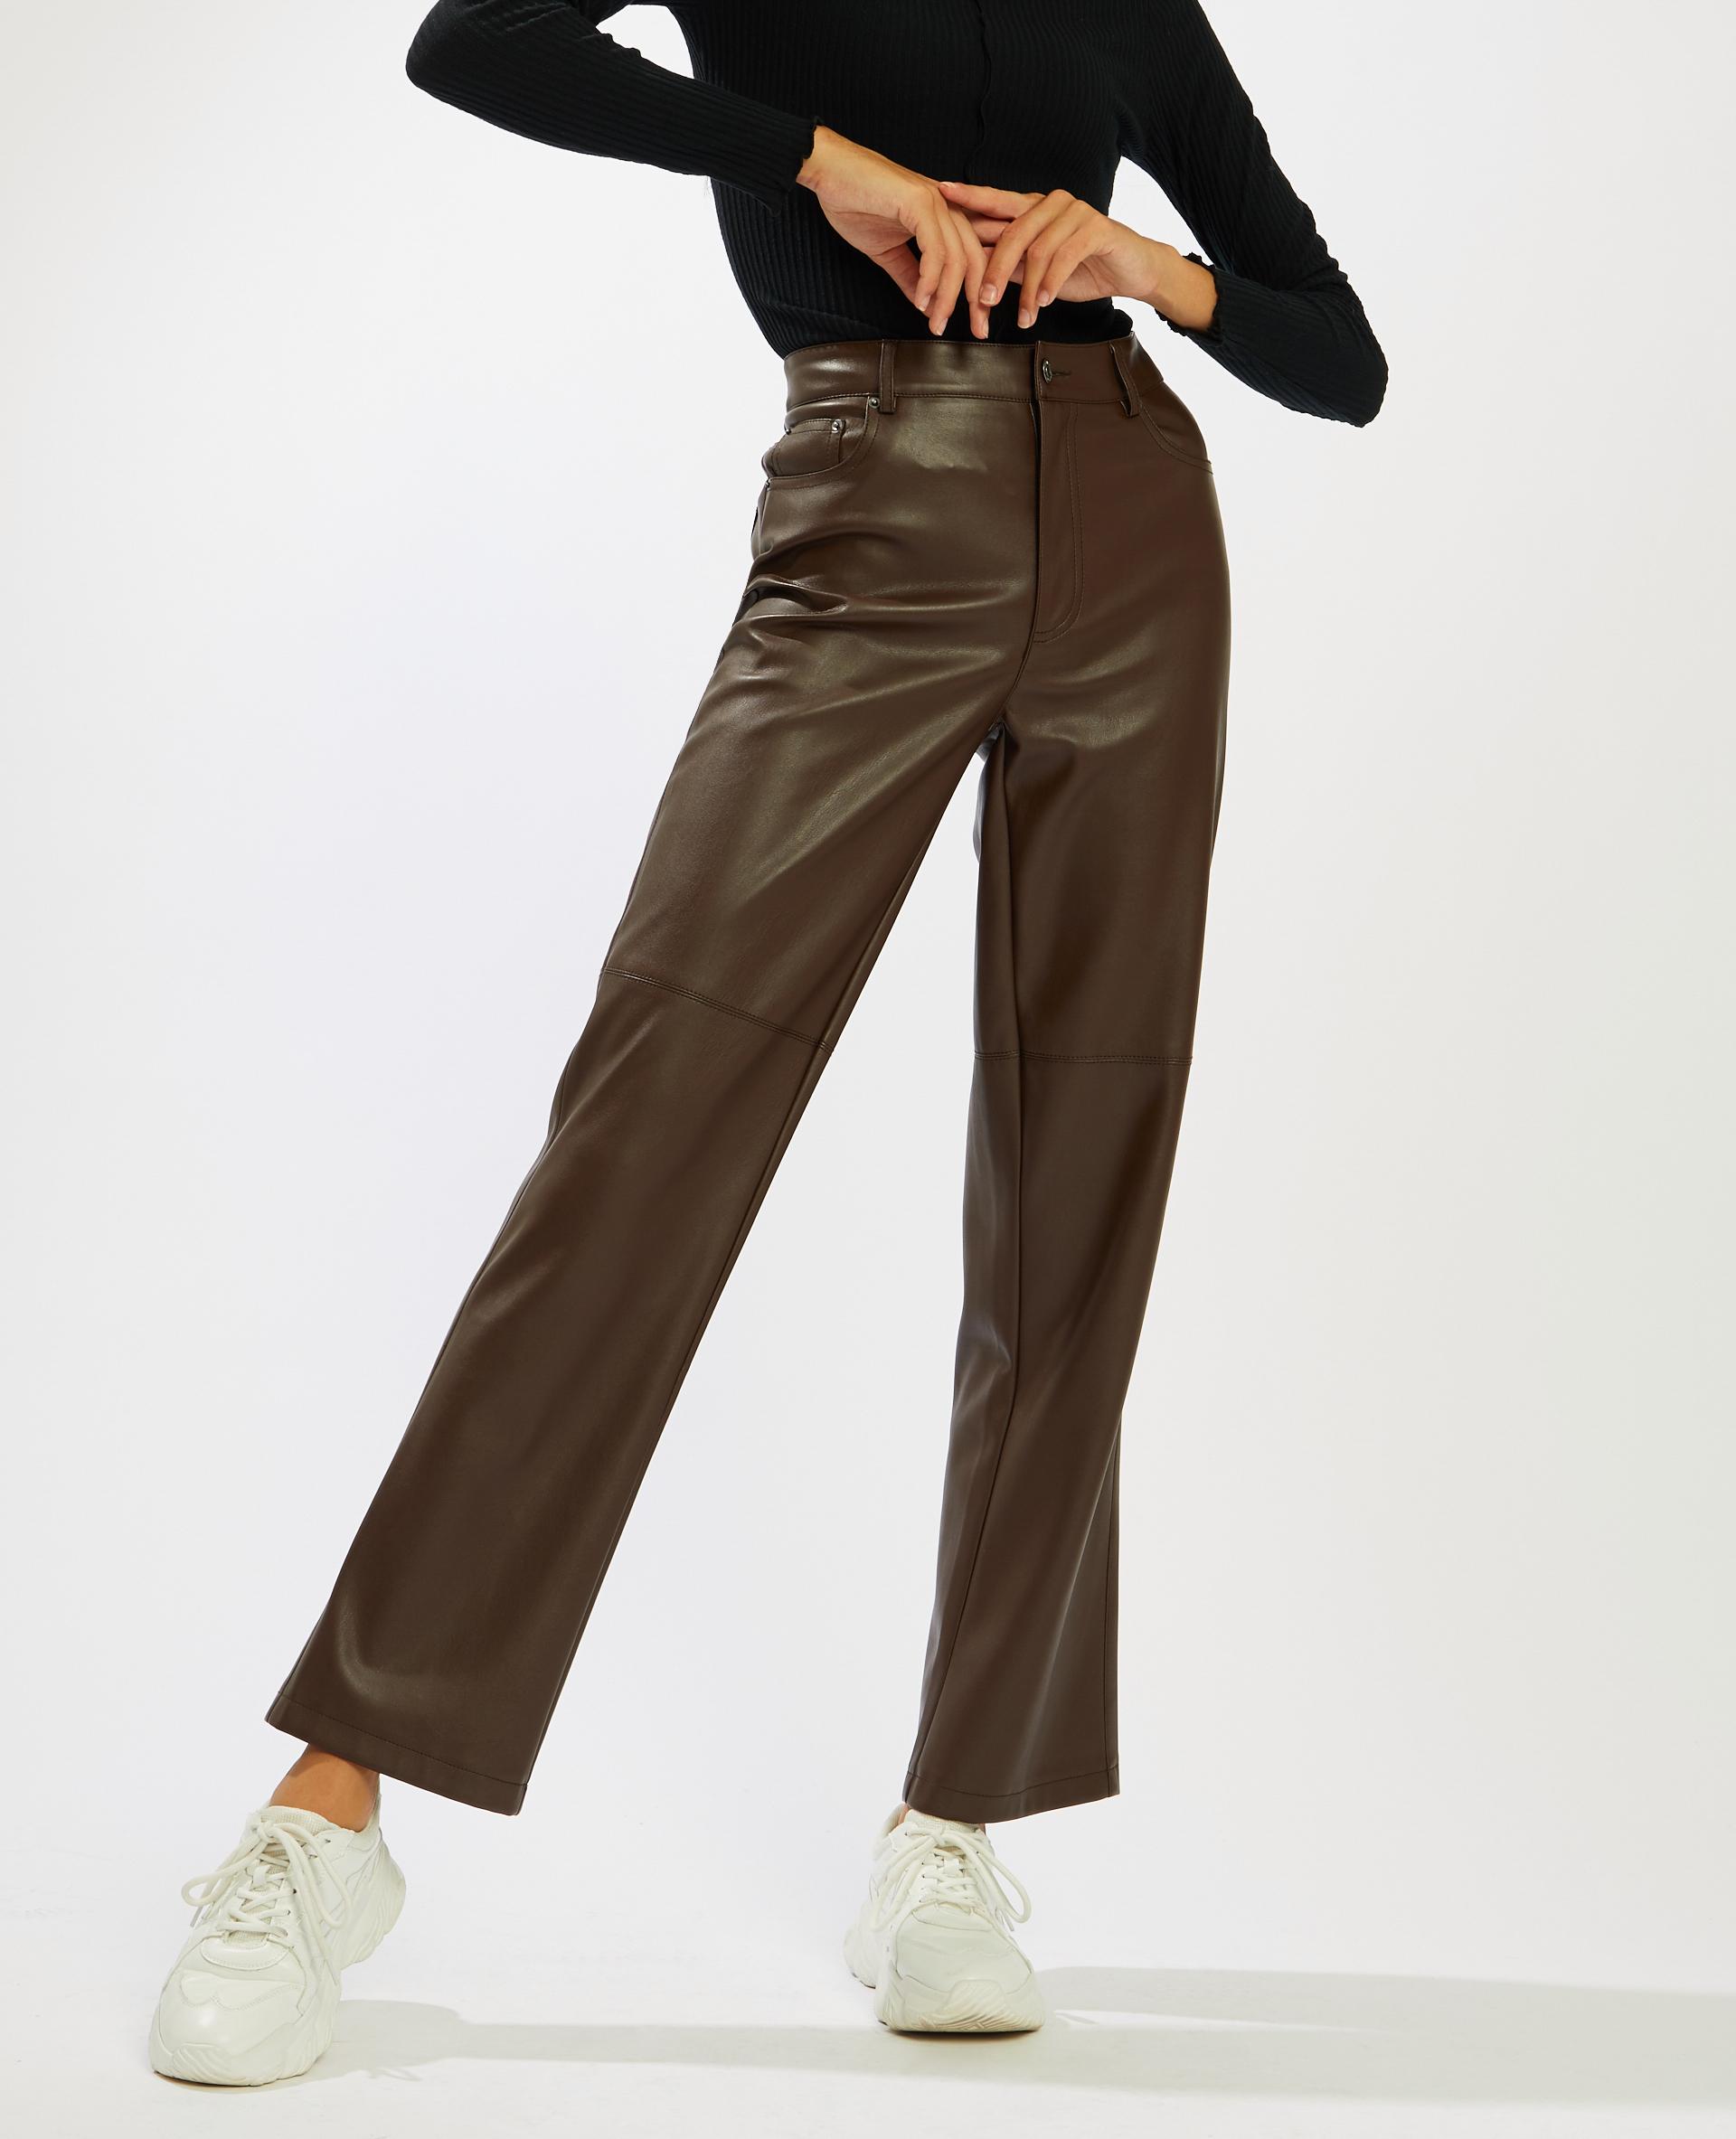 Pantalone dritto in similpelle marrone - Pimkie